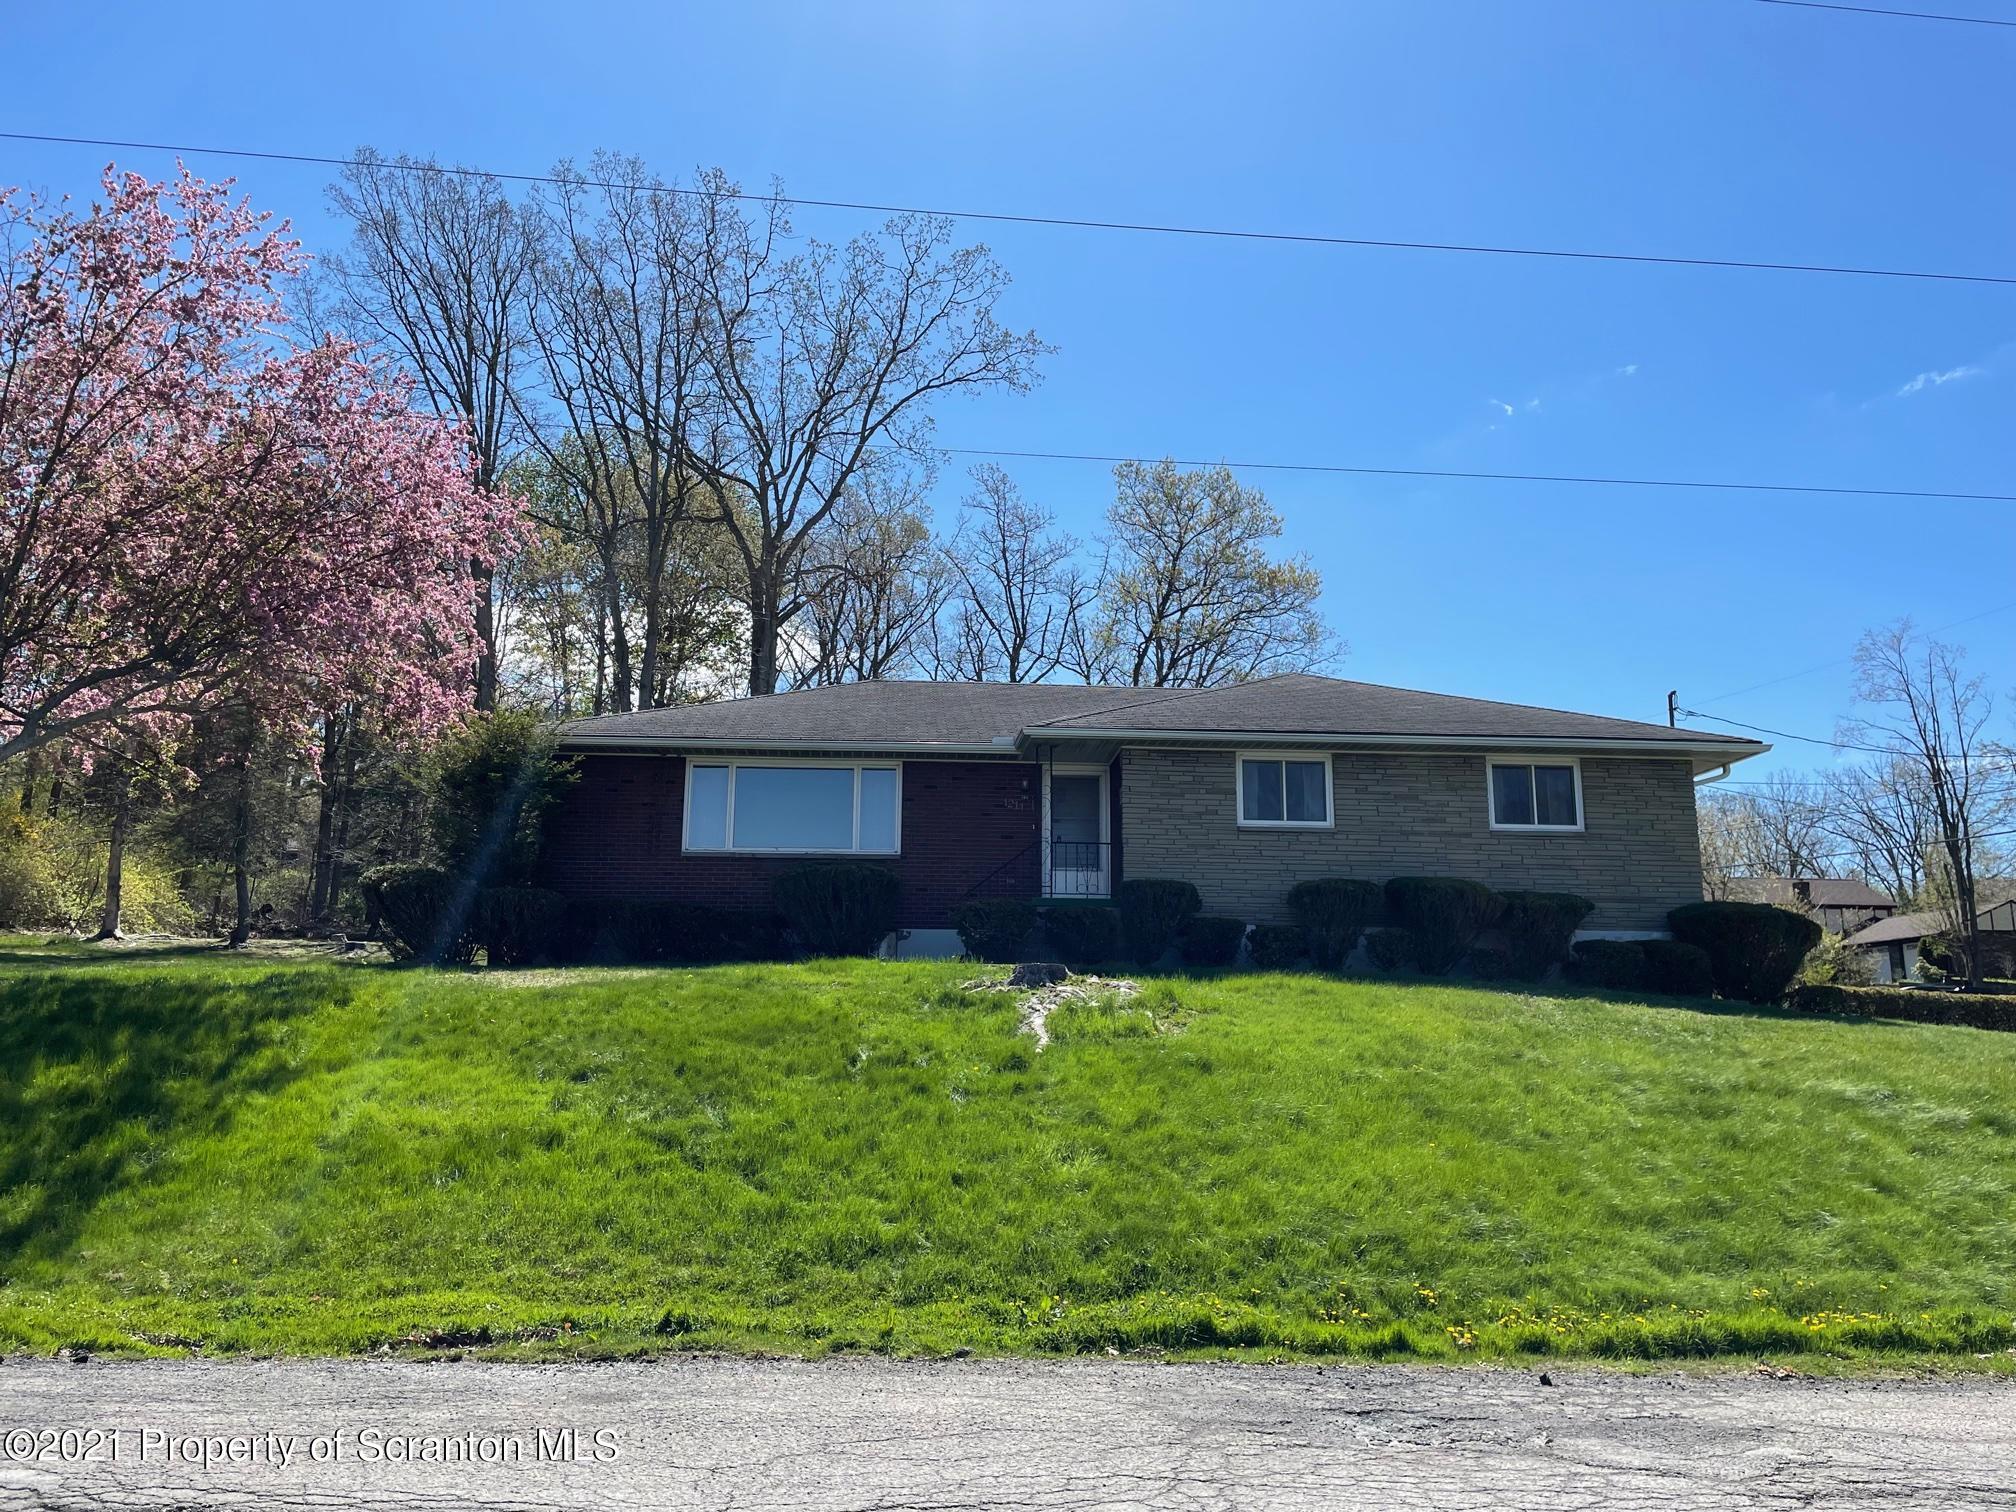 1211 Rollin St, Scranton, Pennsylvania 18505, 3 Bedrooms Bedrooms, 6 Rooms Rooms,2 BathroomsBathrooms,Single Family,For Sale,Rollin,21-1720